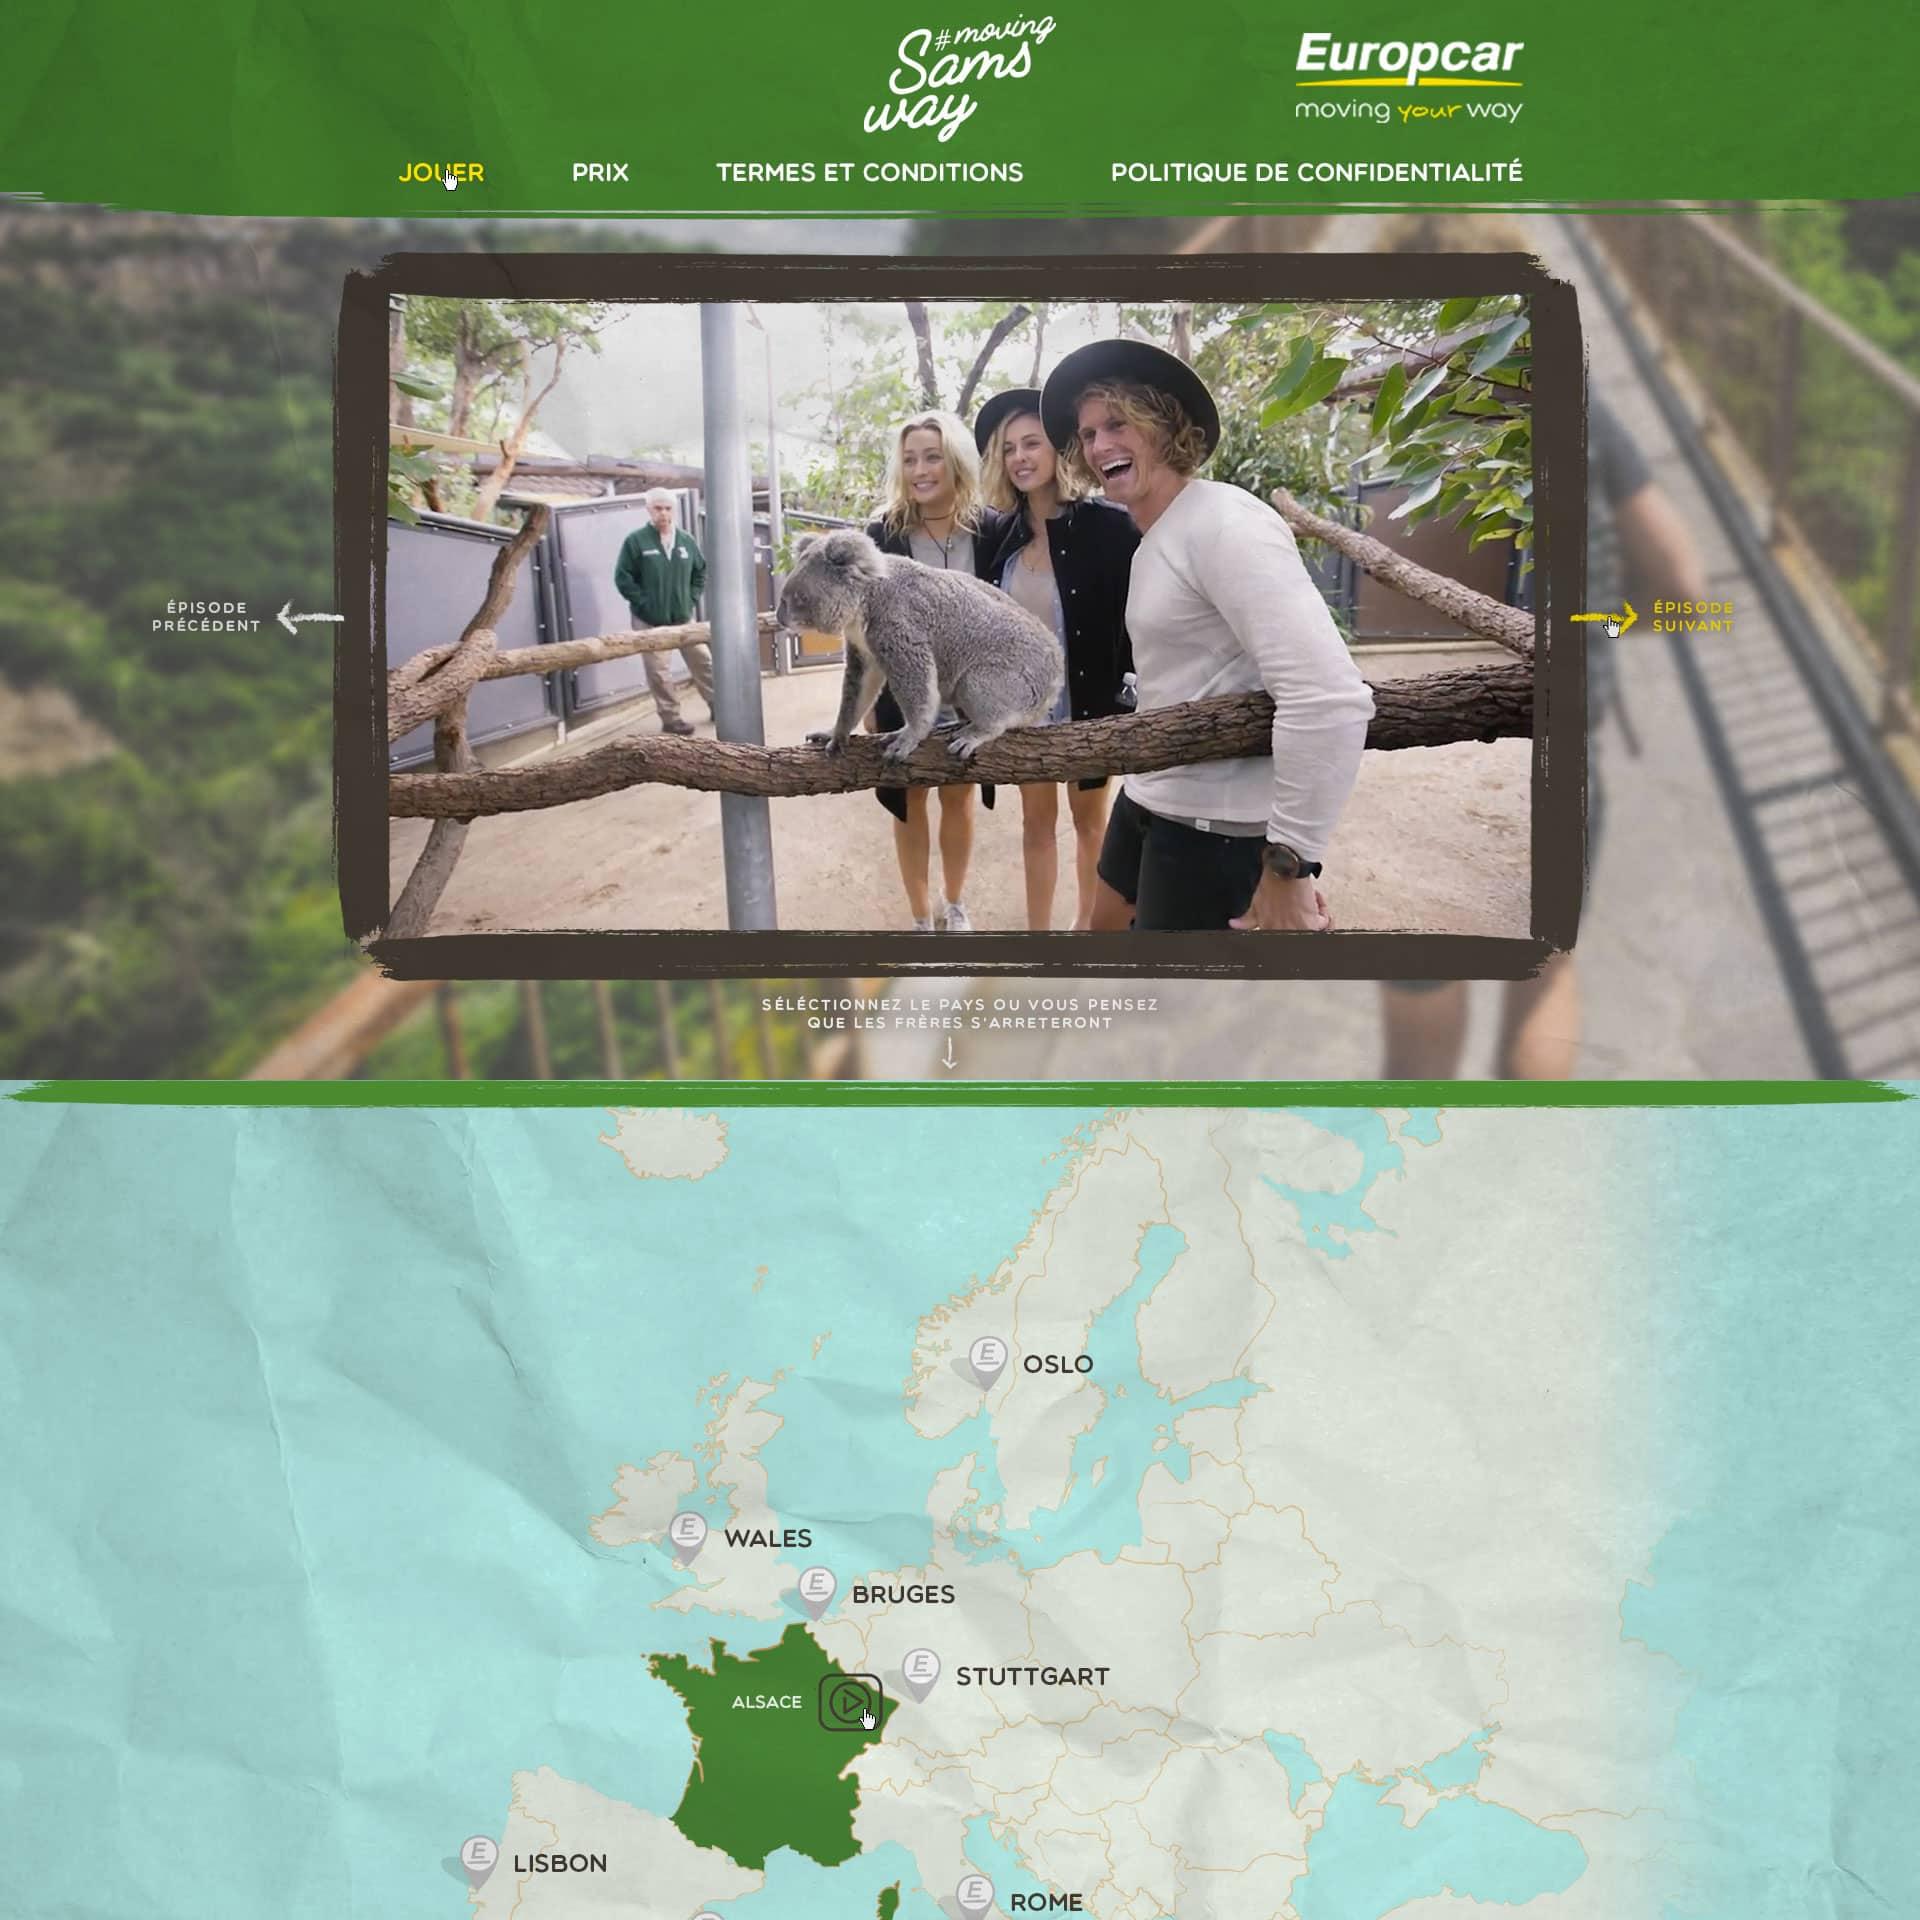 Application Facebook Europcar